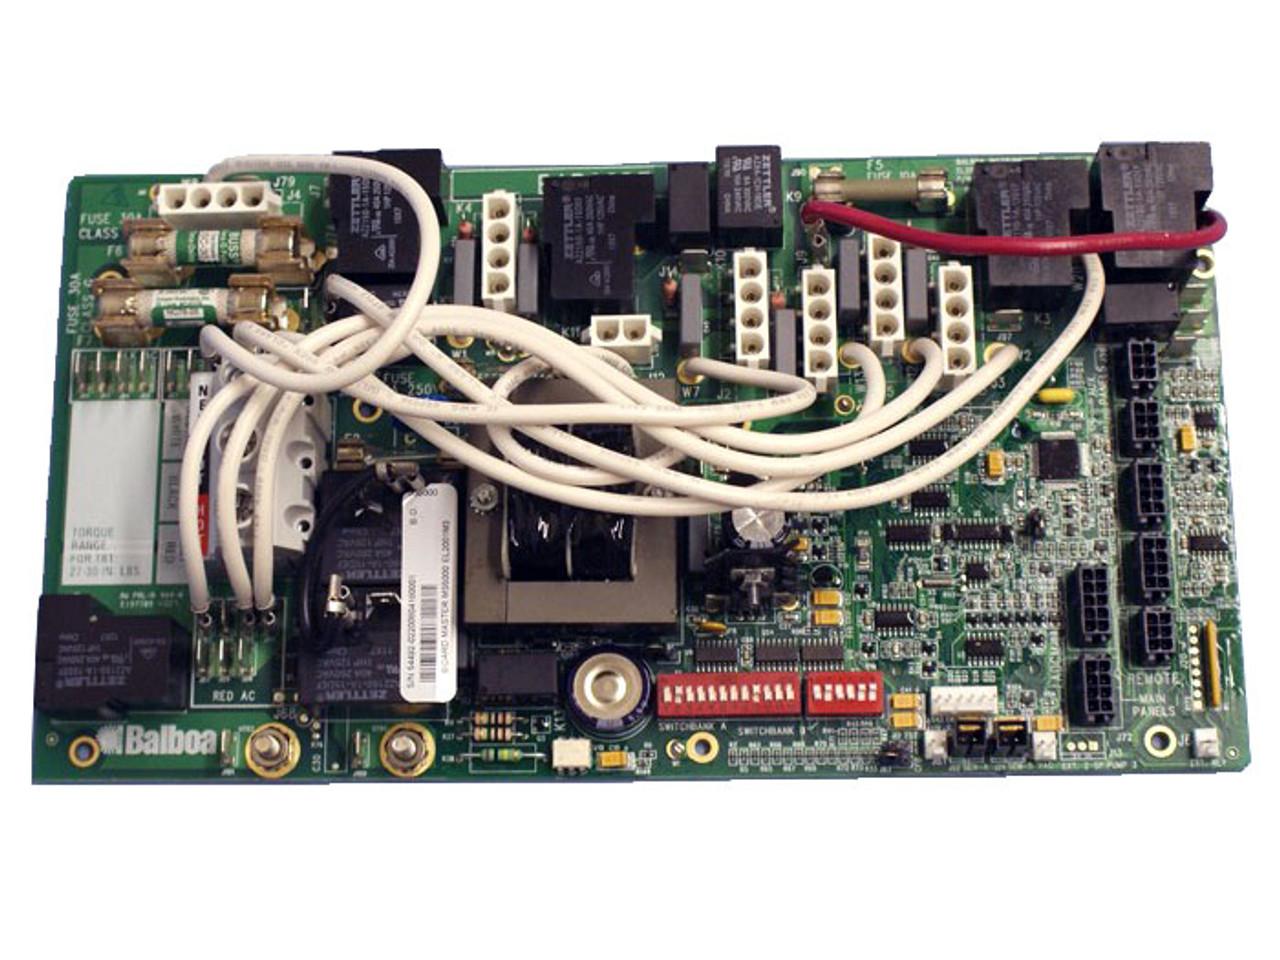 X801095 - Balboa Equipment MS5000 PC Board Starting 2006 on spa diagram, balboa control diagram, balboa control panel, balboa schematic, balboa heater,